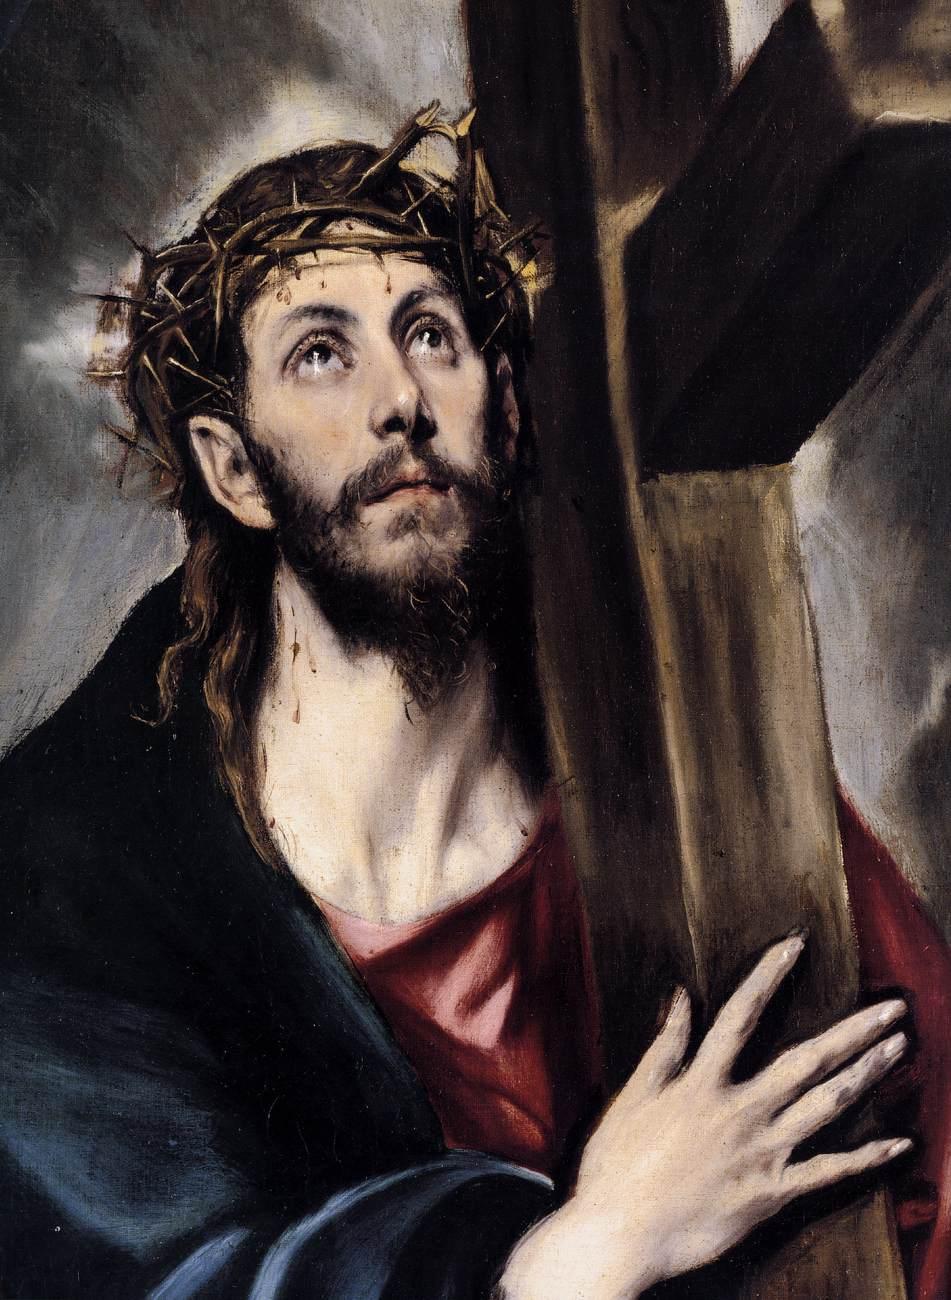 https://elniplex.files.wordpress.com/2013/04/christ-carrying-the-cross-el-greco-cf80ceb5cf81-1580.jpg